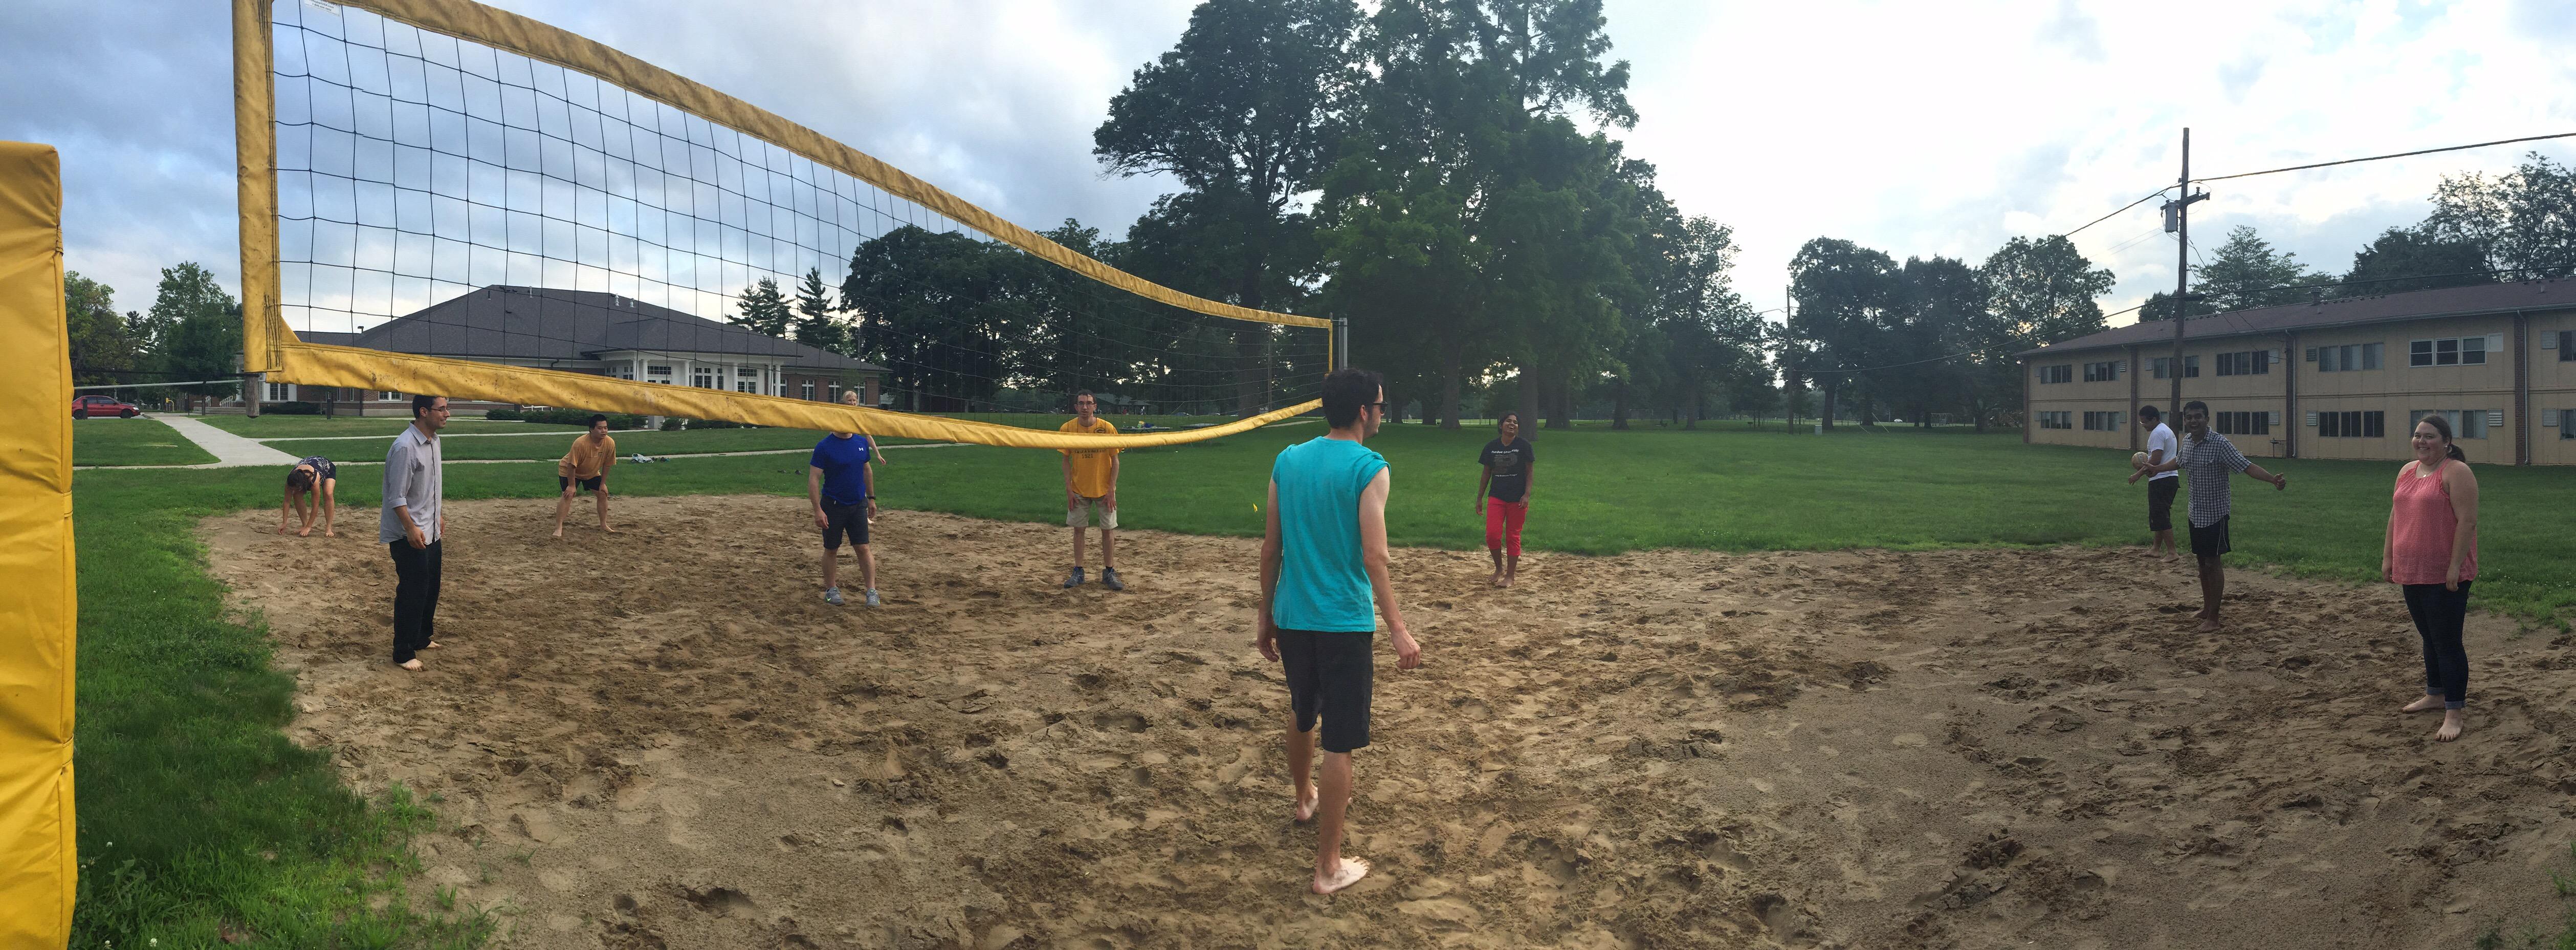 11 sand vball